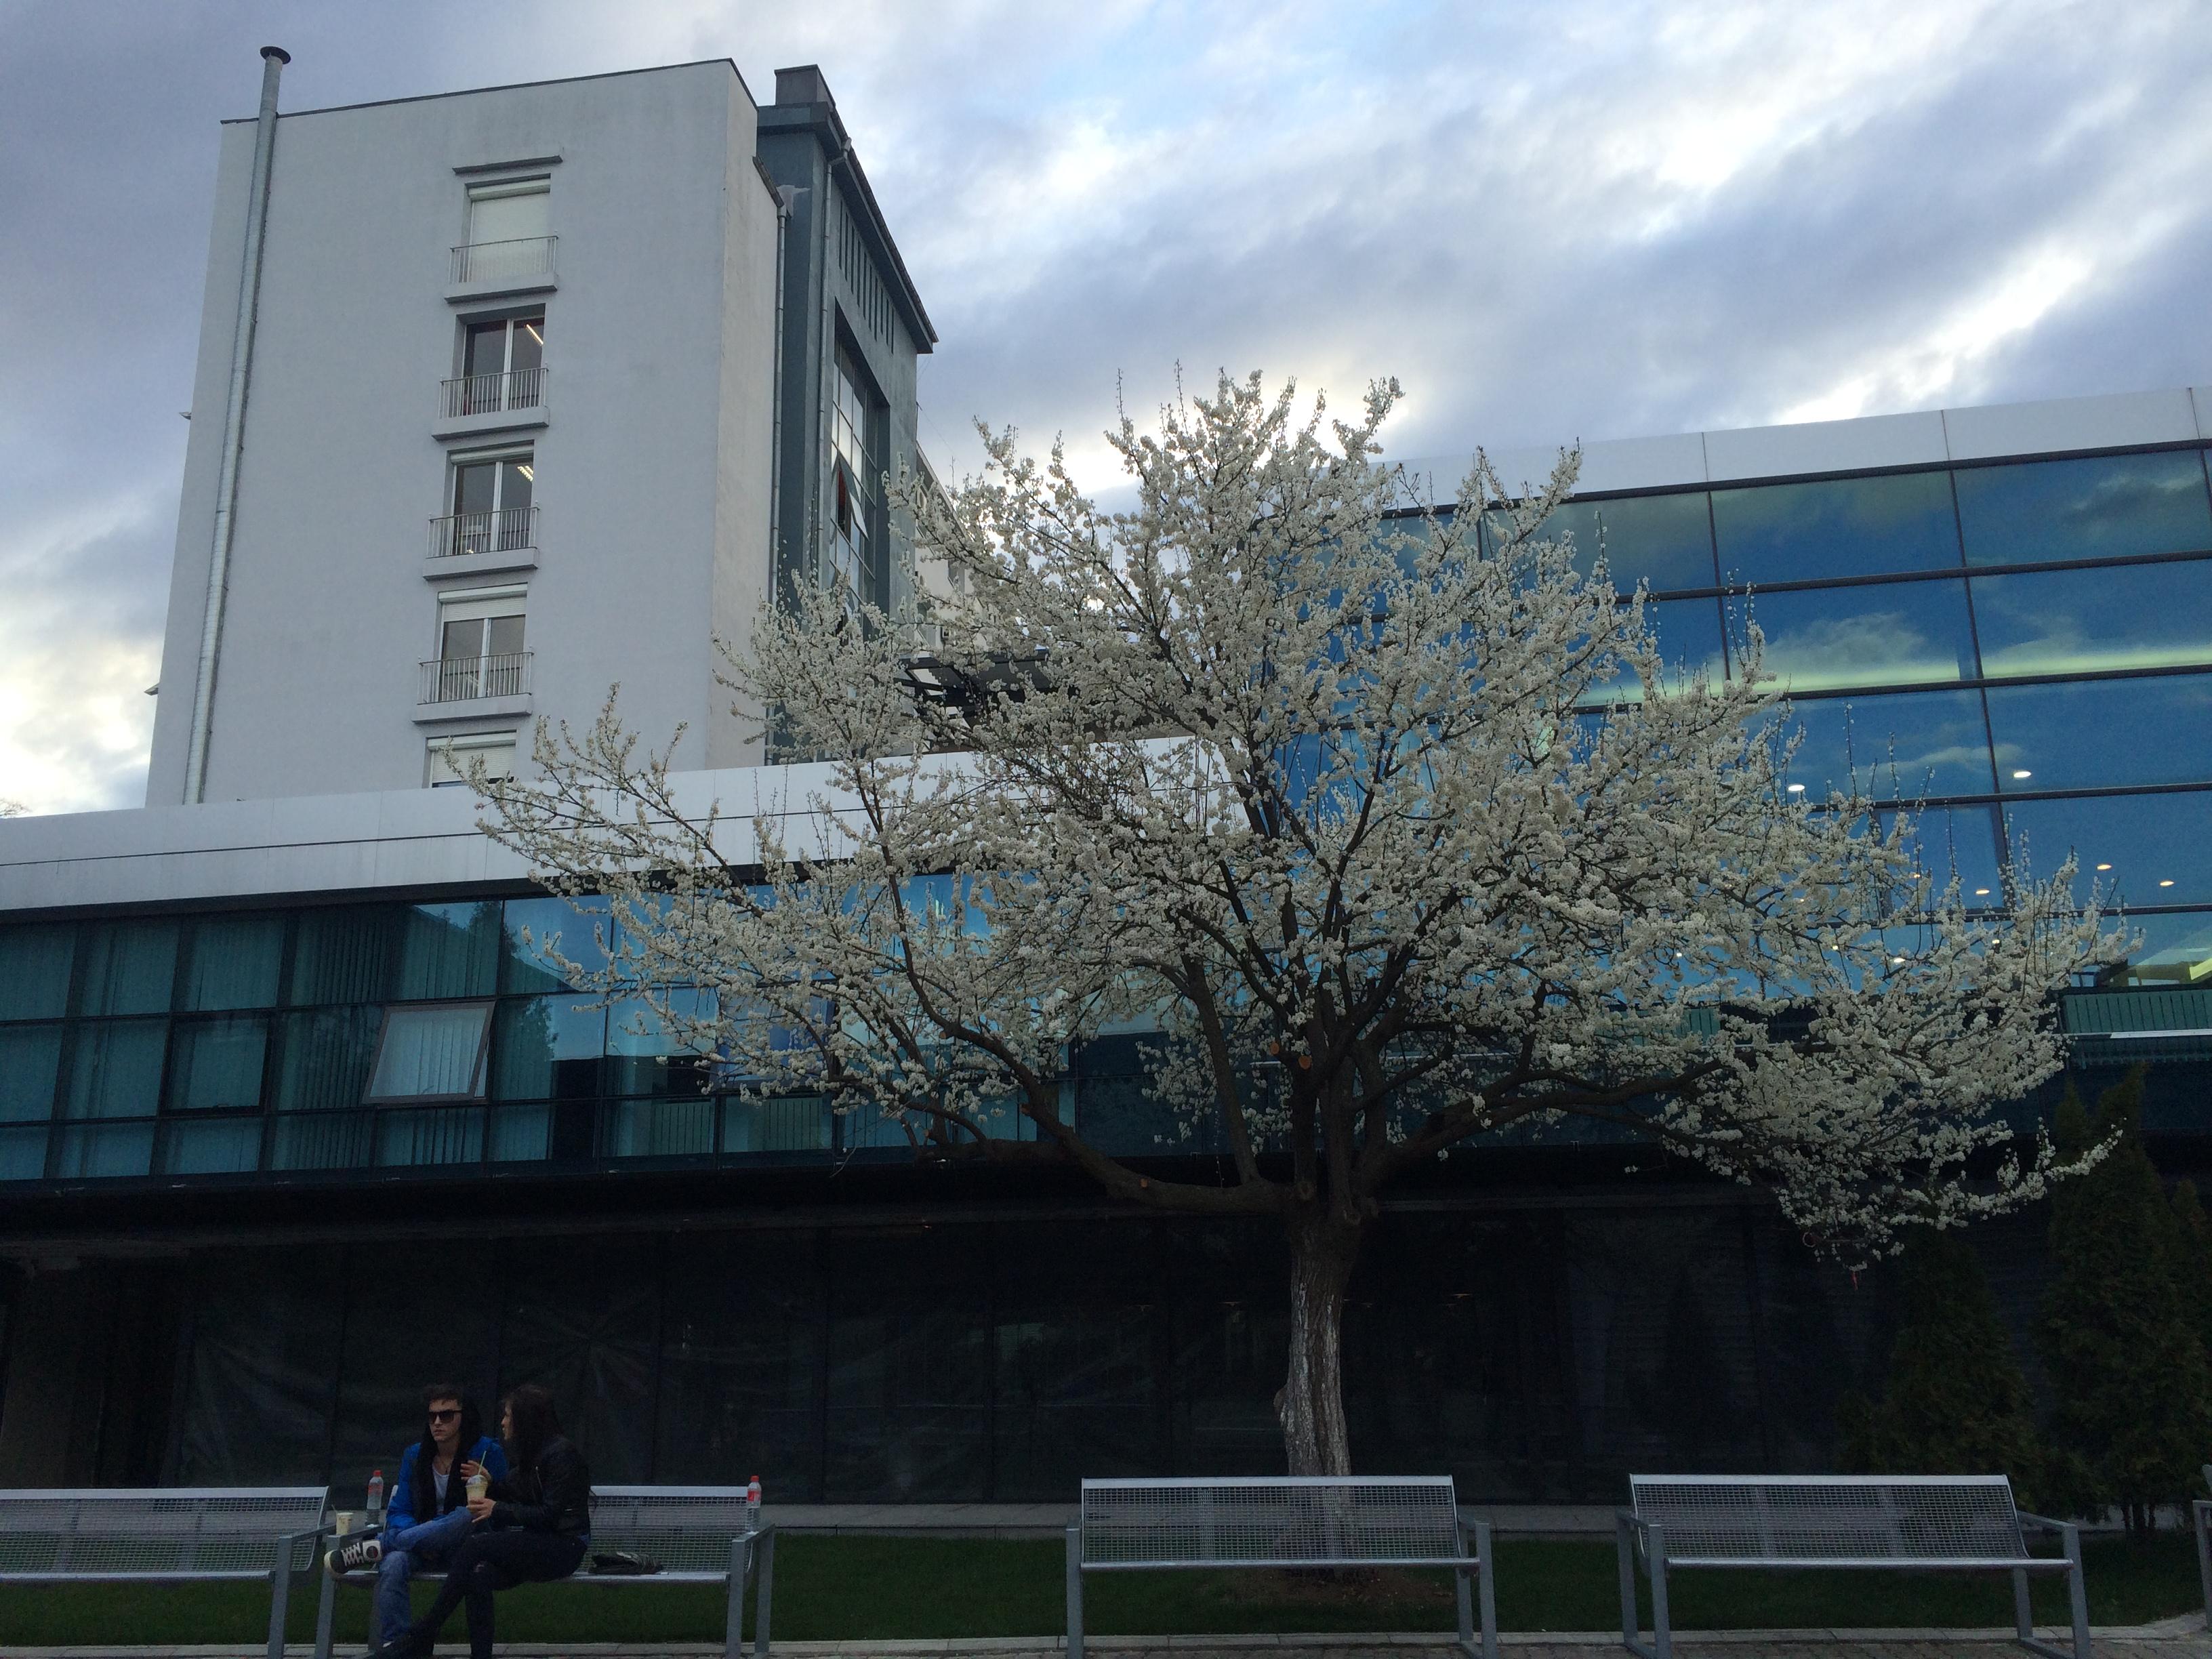 New Bulgarian University, Department of Music